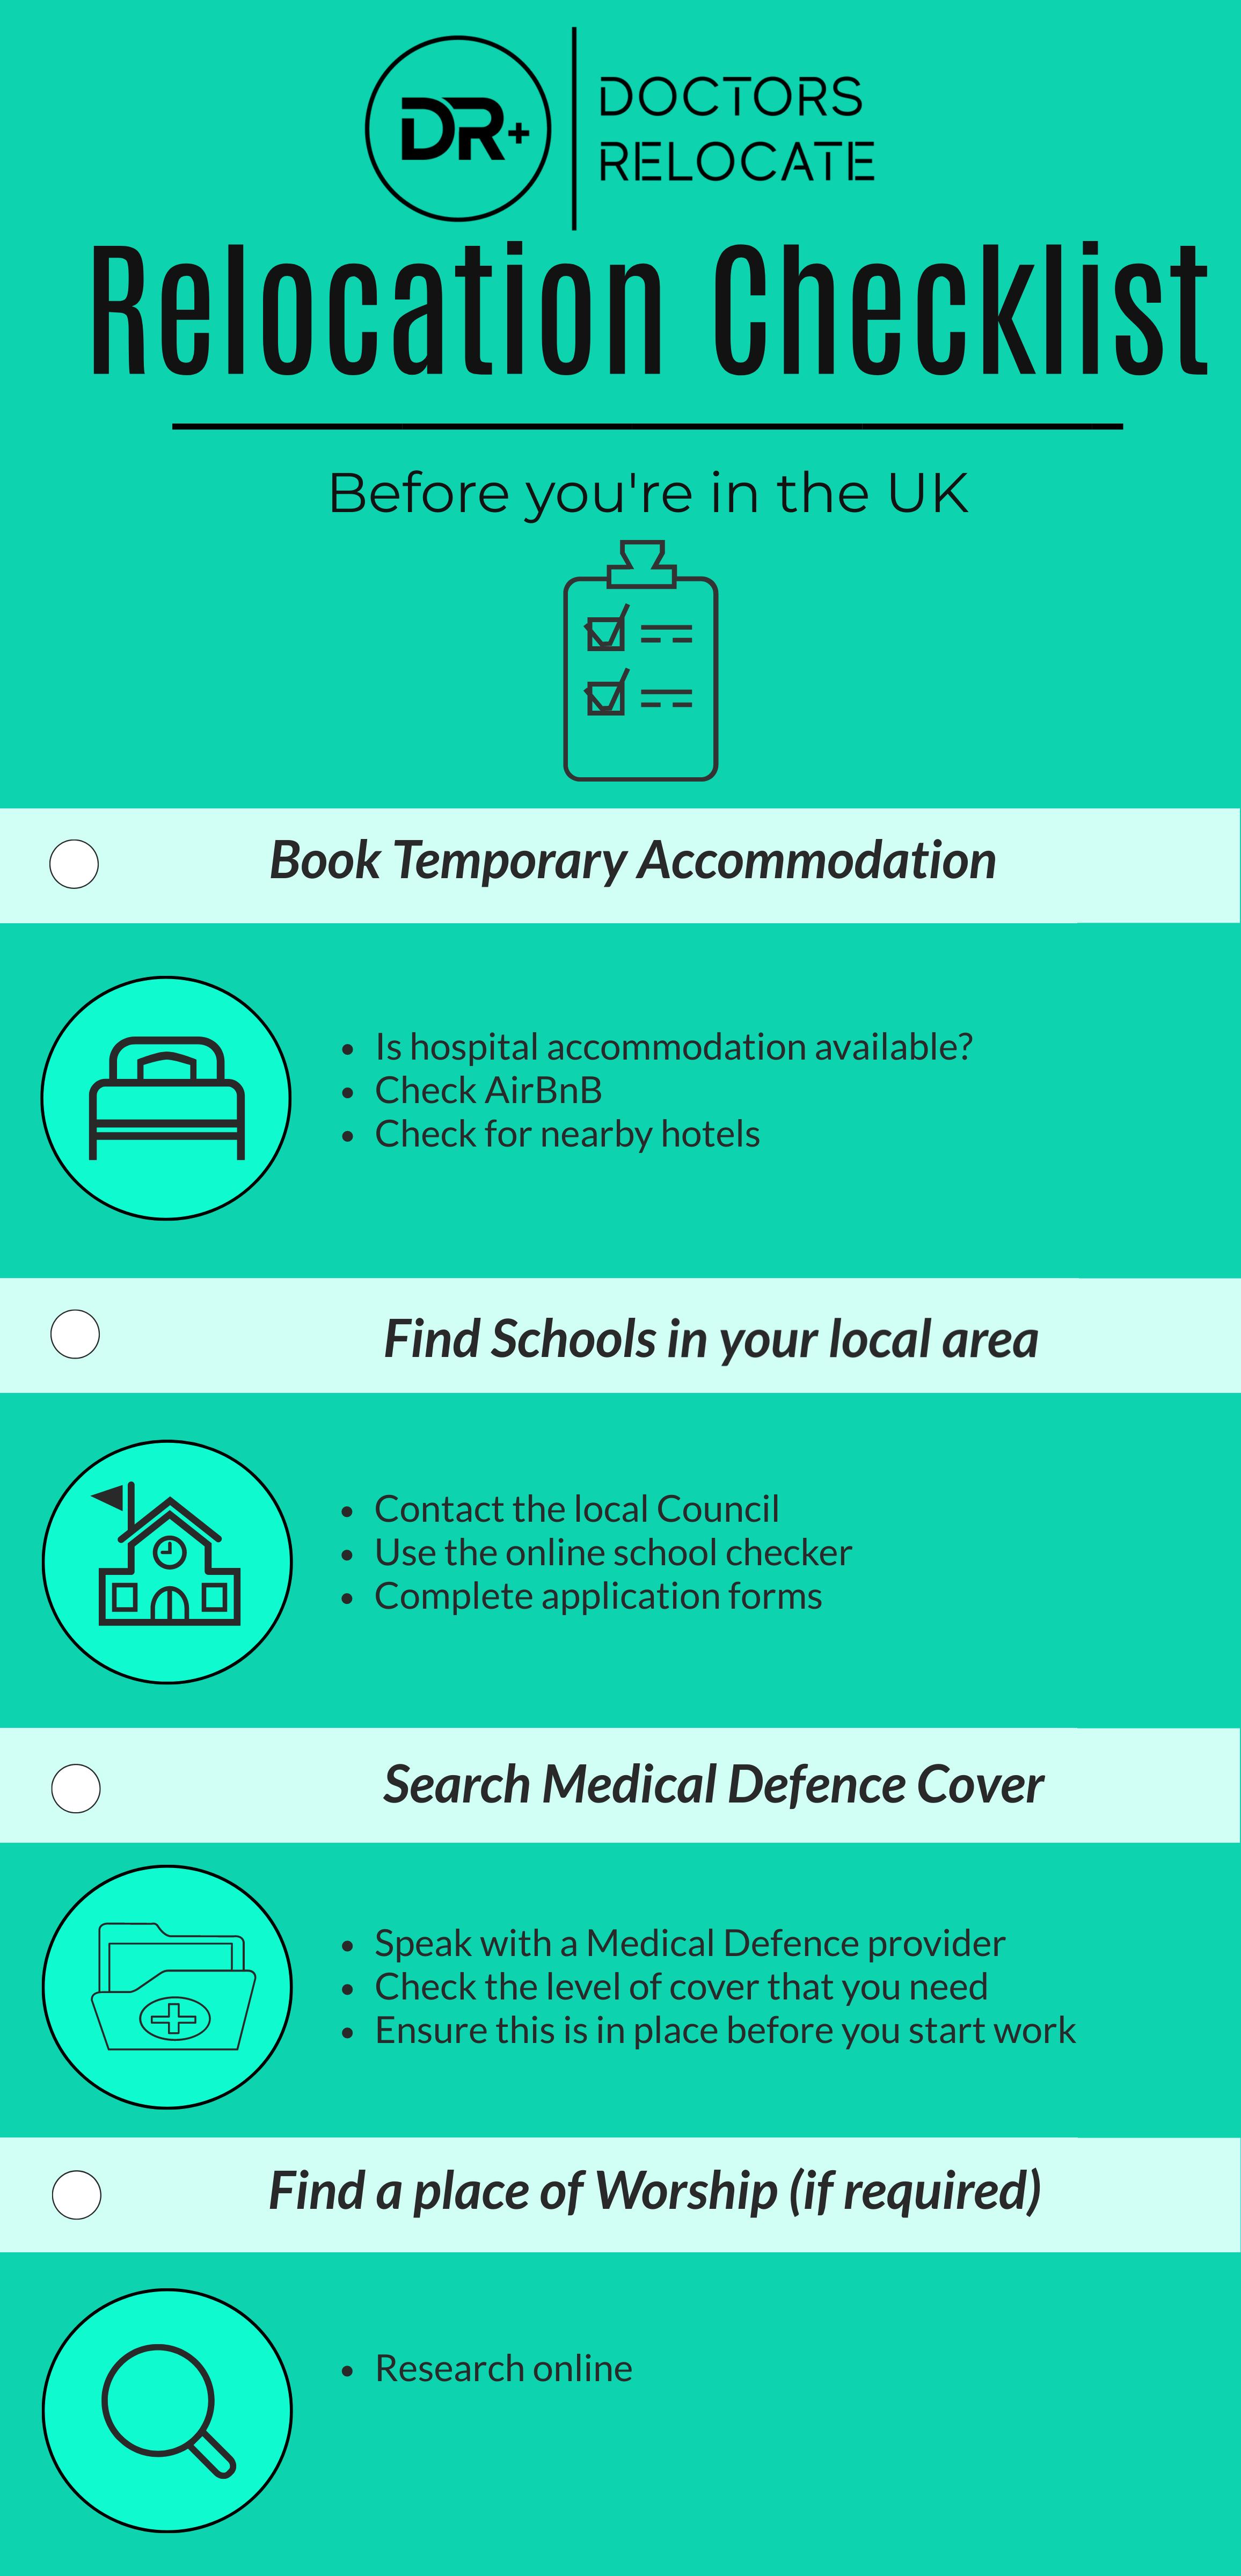 Relocation Guide for Doctors - Checklist 1